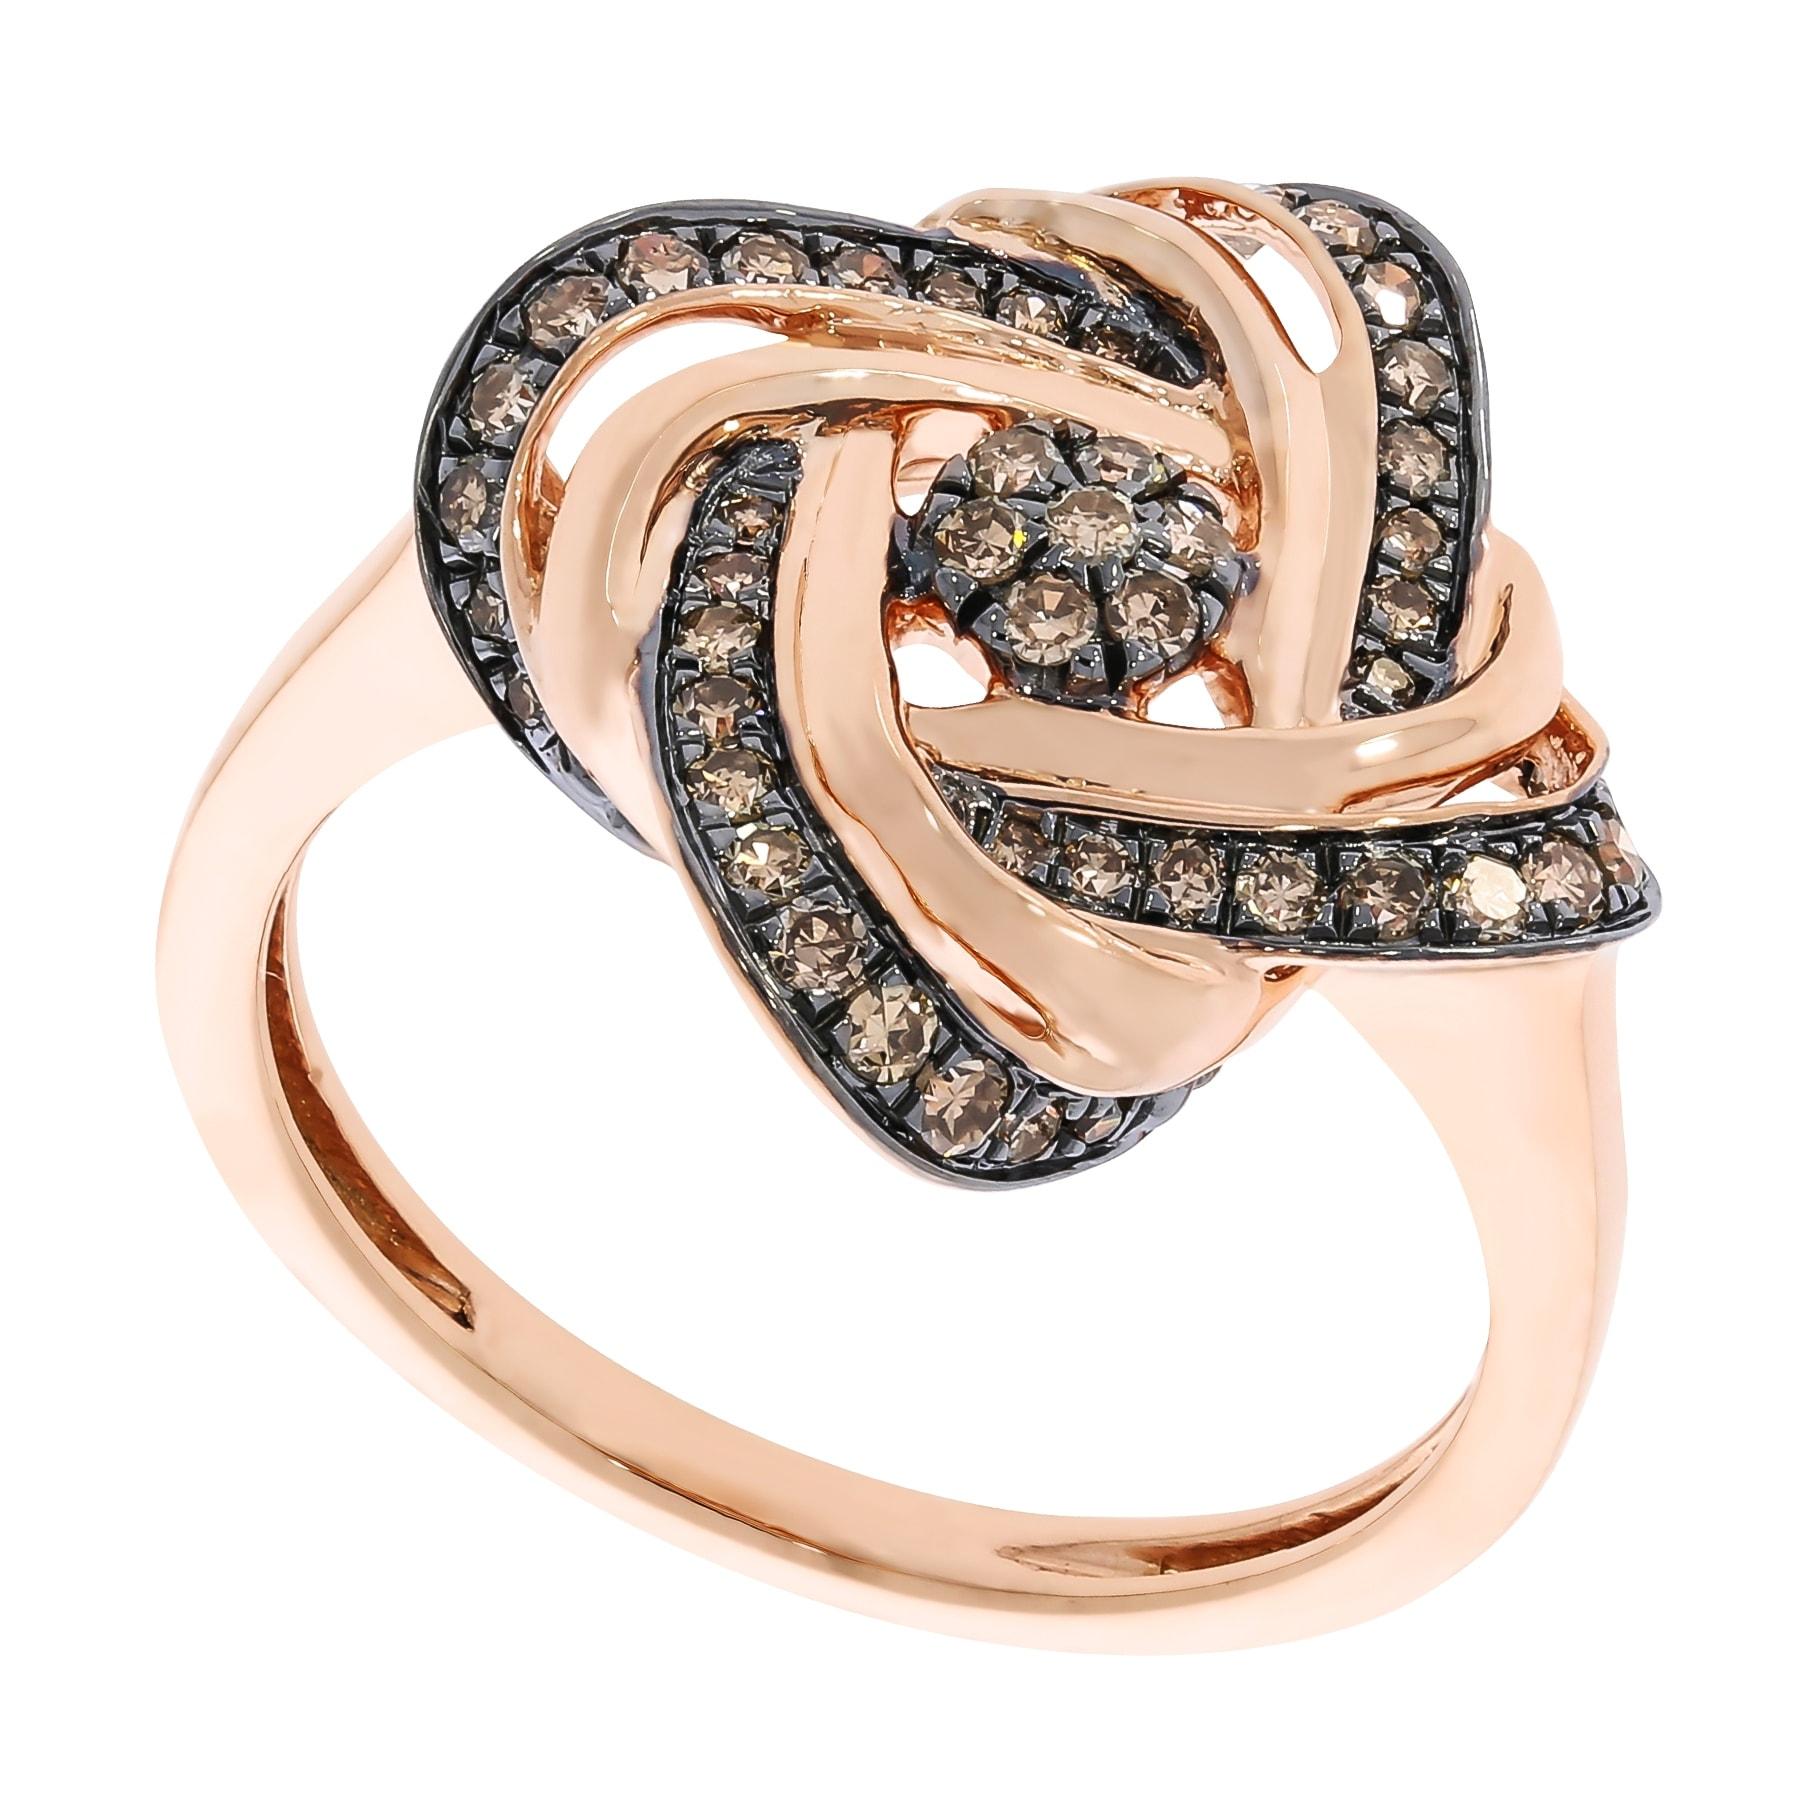 Suzy Levian Diamond Rings For Less